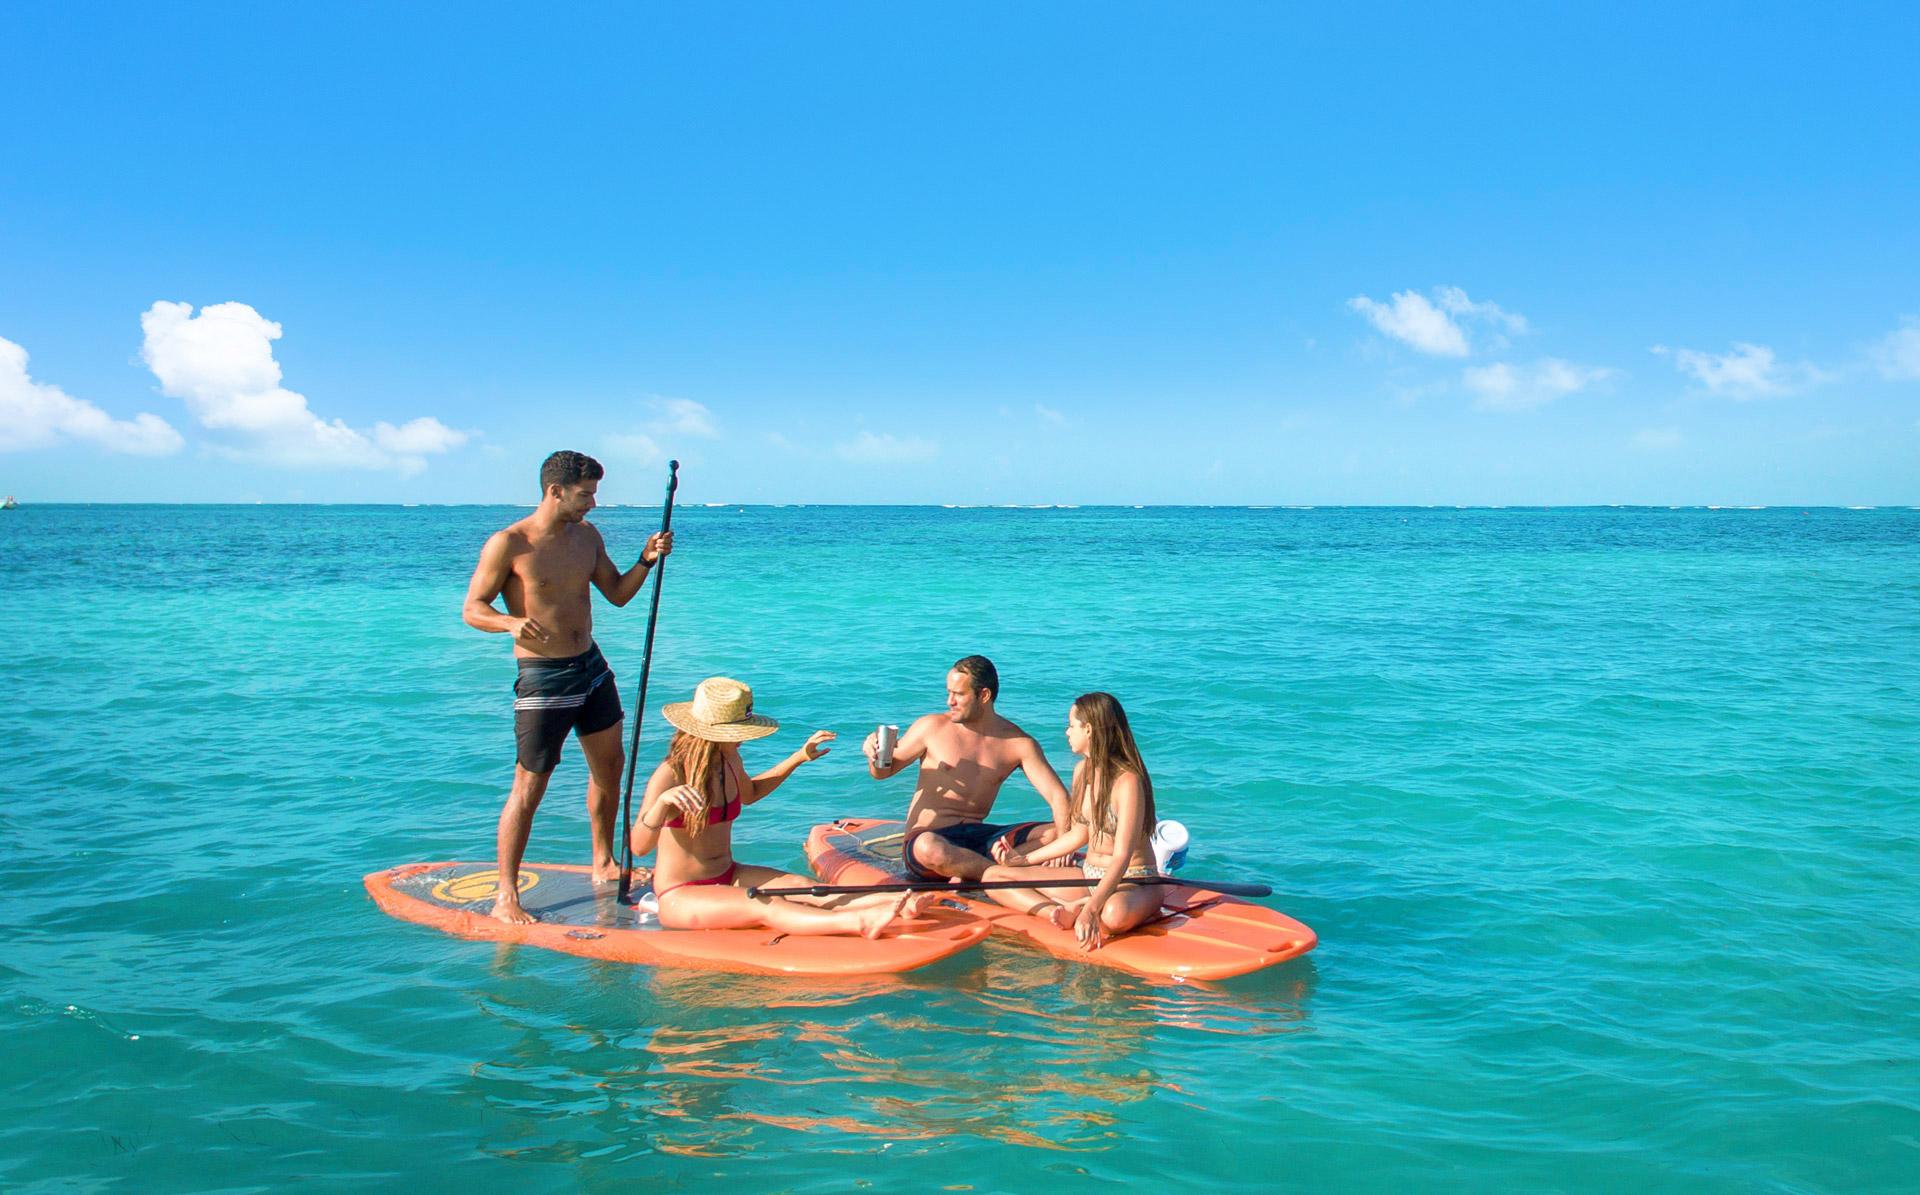 happy-fish-catamaran-new2.jpg